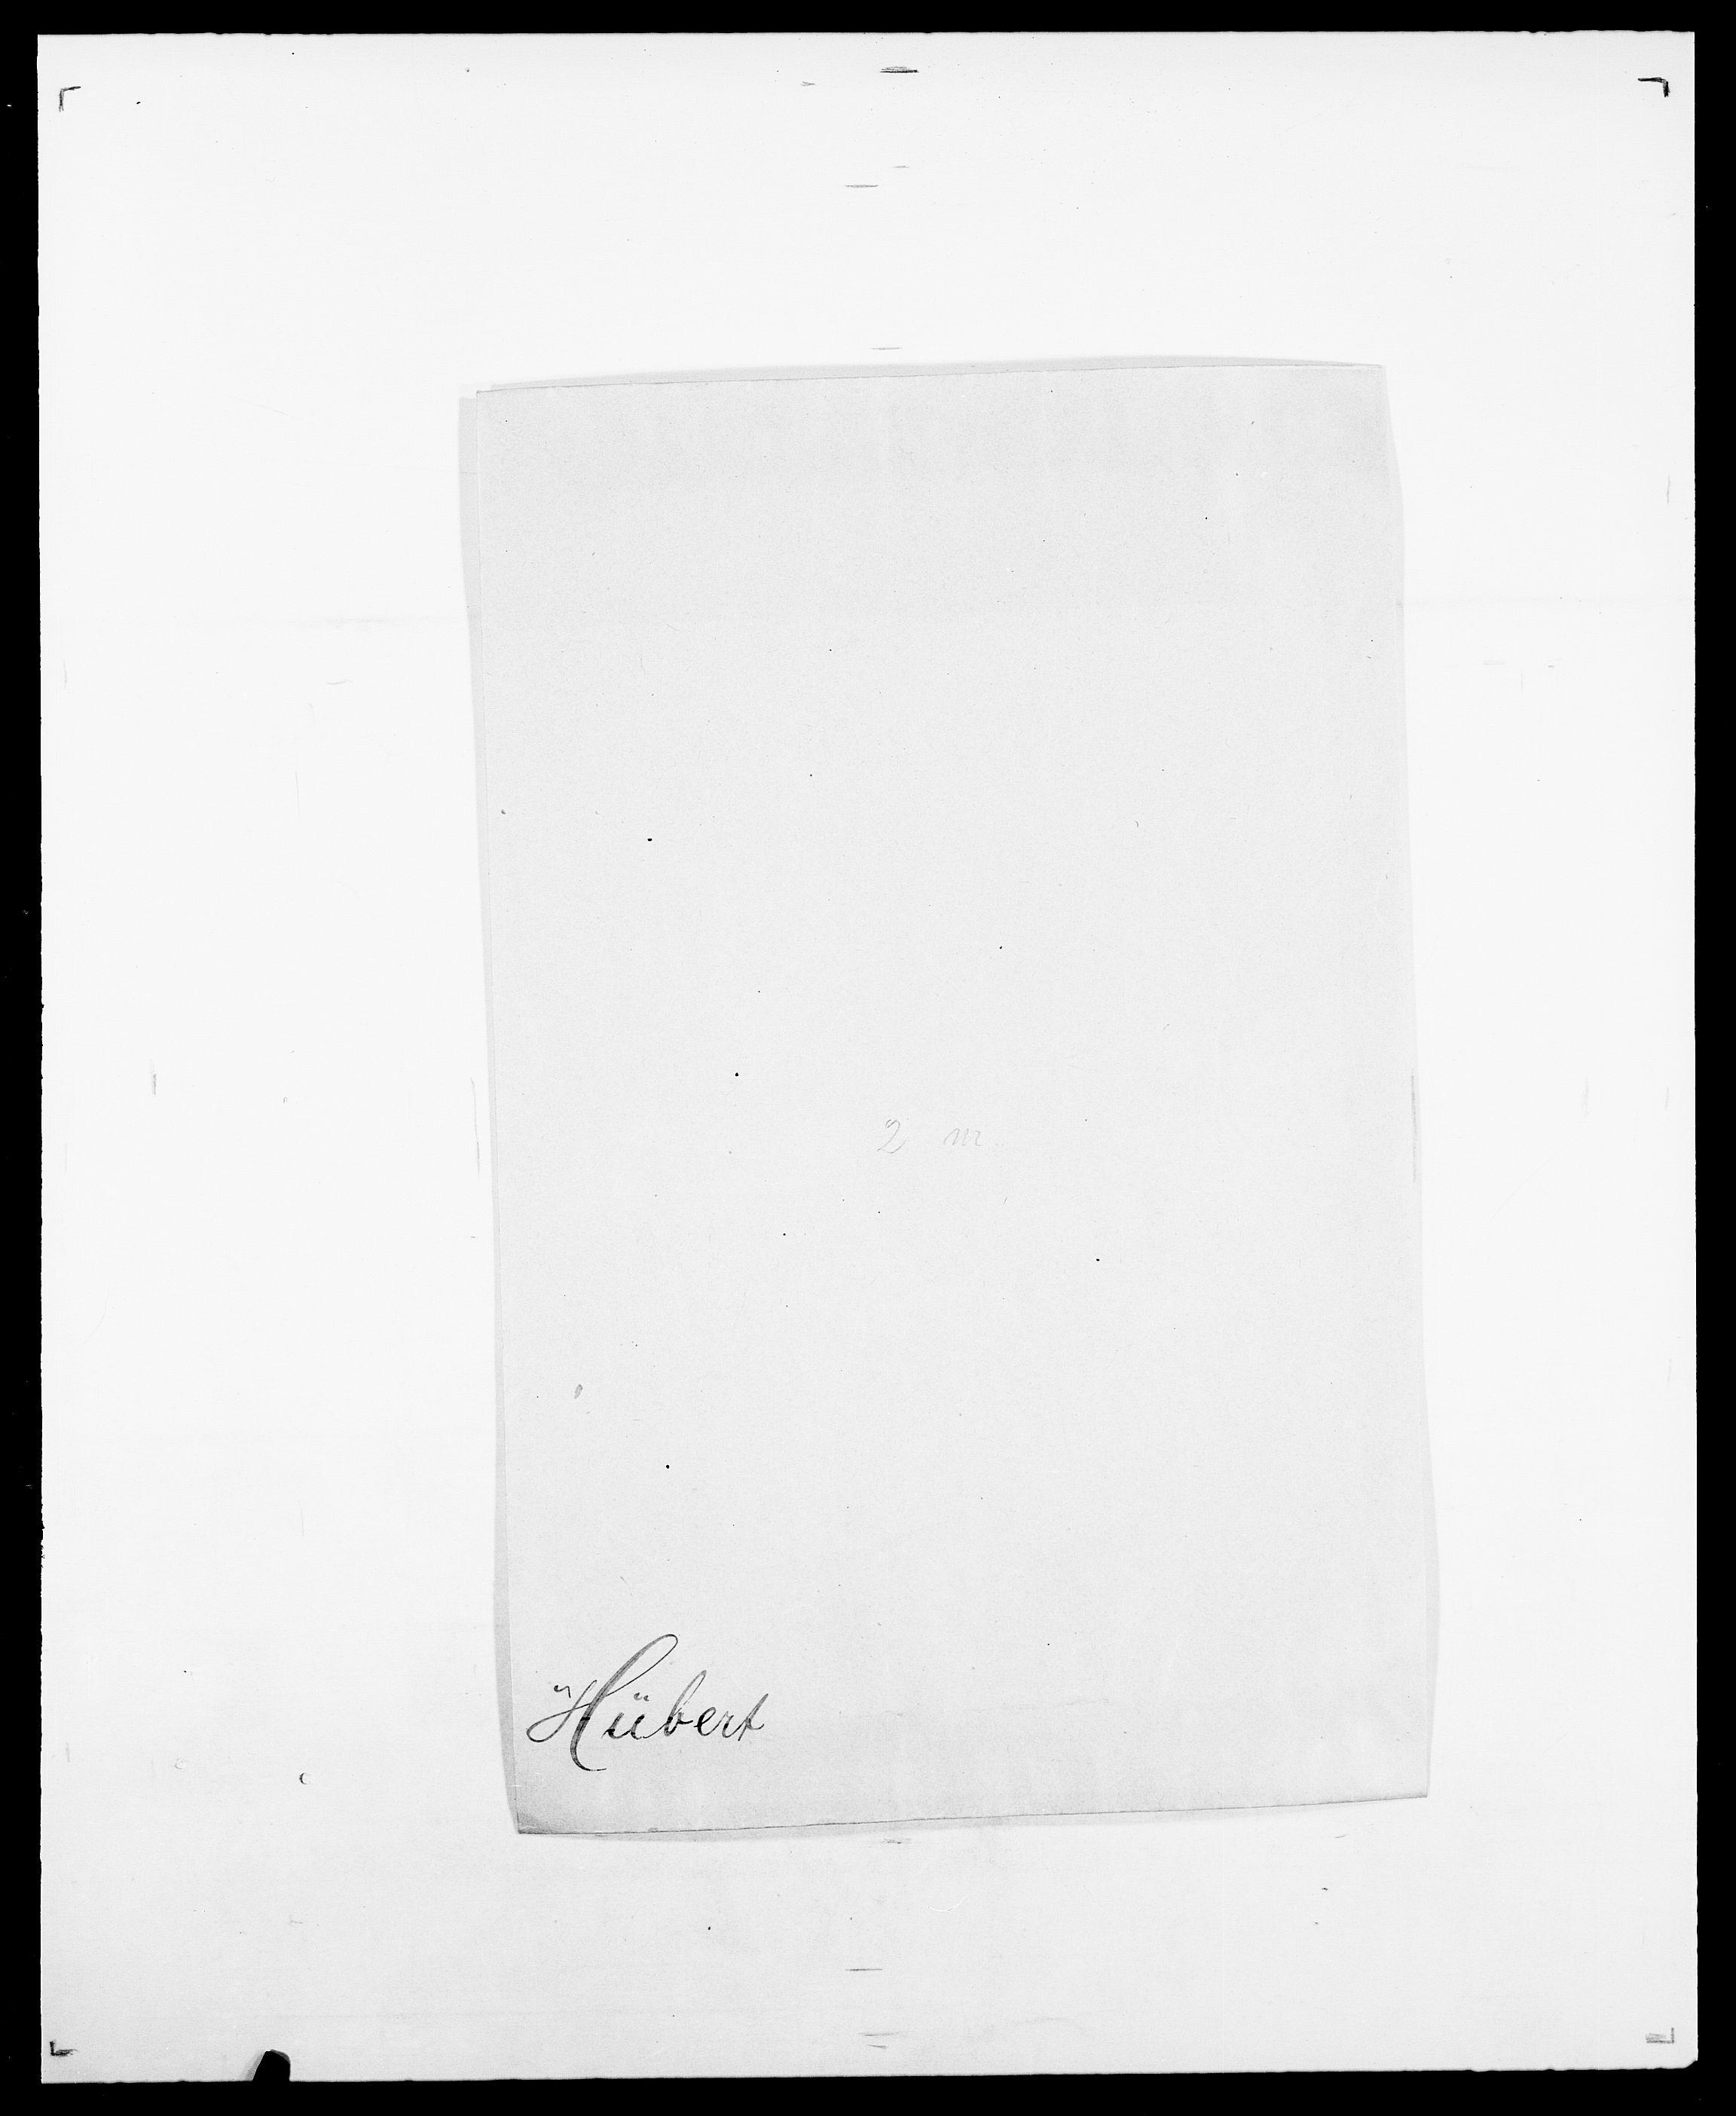 SAO, Delgobe, Charles Antoine - samling, D/Da/L0019: van der Hude - Joys, s. 232